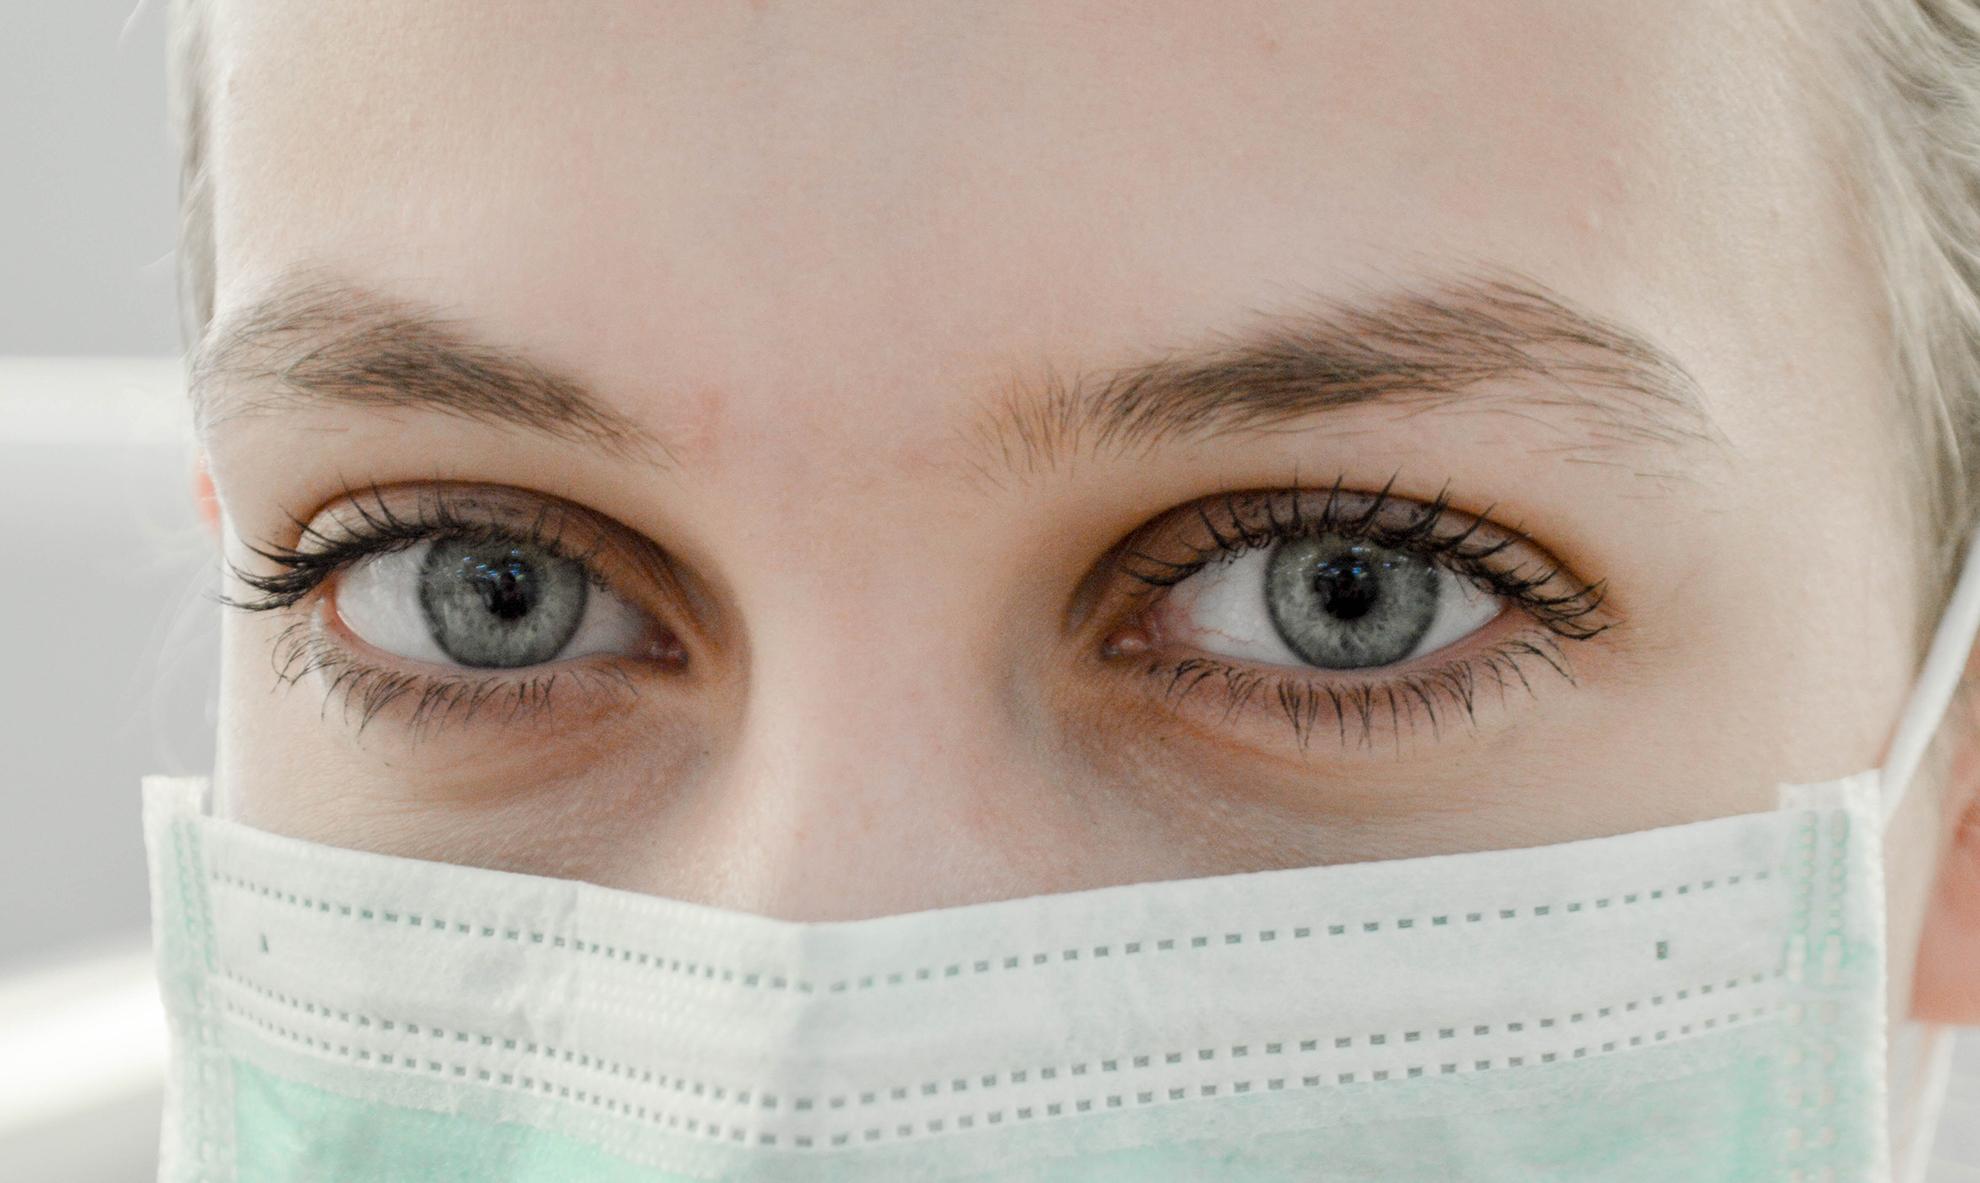 Coronavirus: Was bringen Atemschutzmasken?